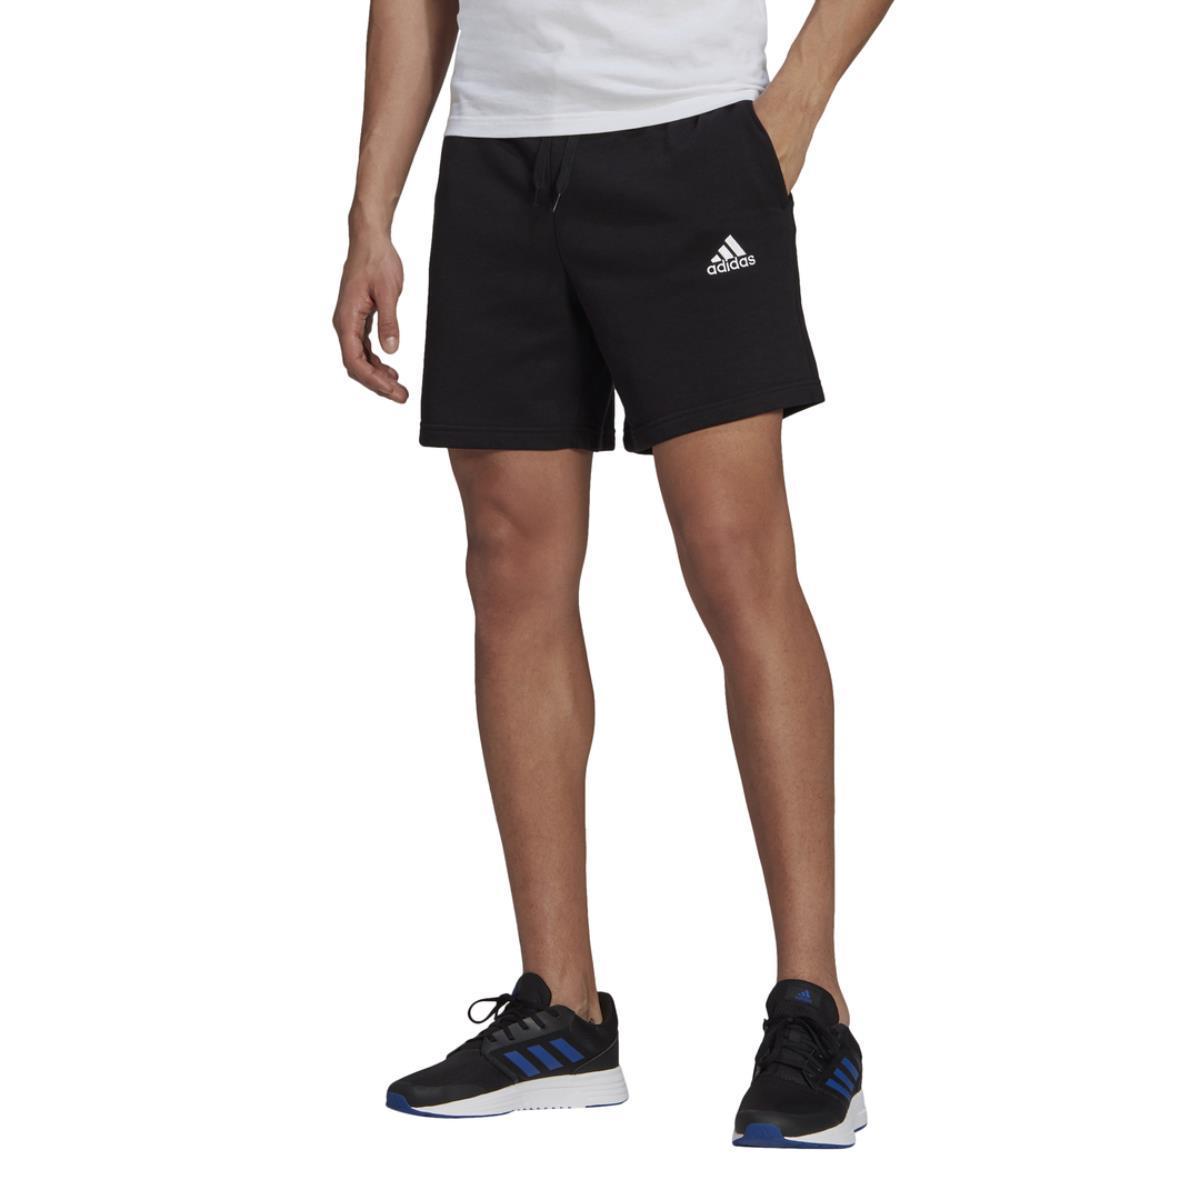 Shorts Adidas Essential con logo ricamato da uomo rif. GK9600